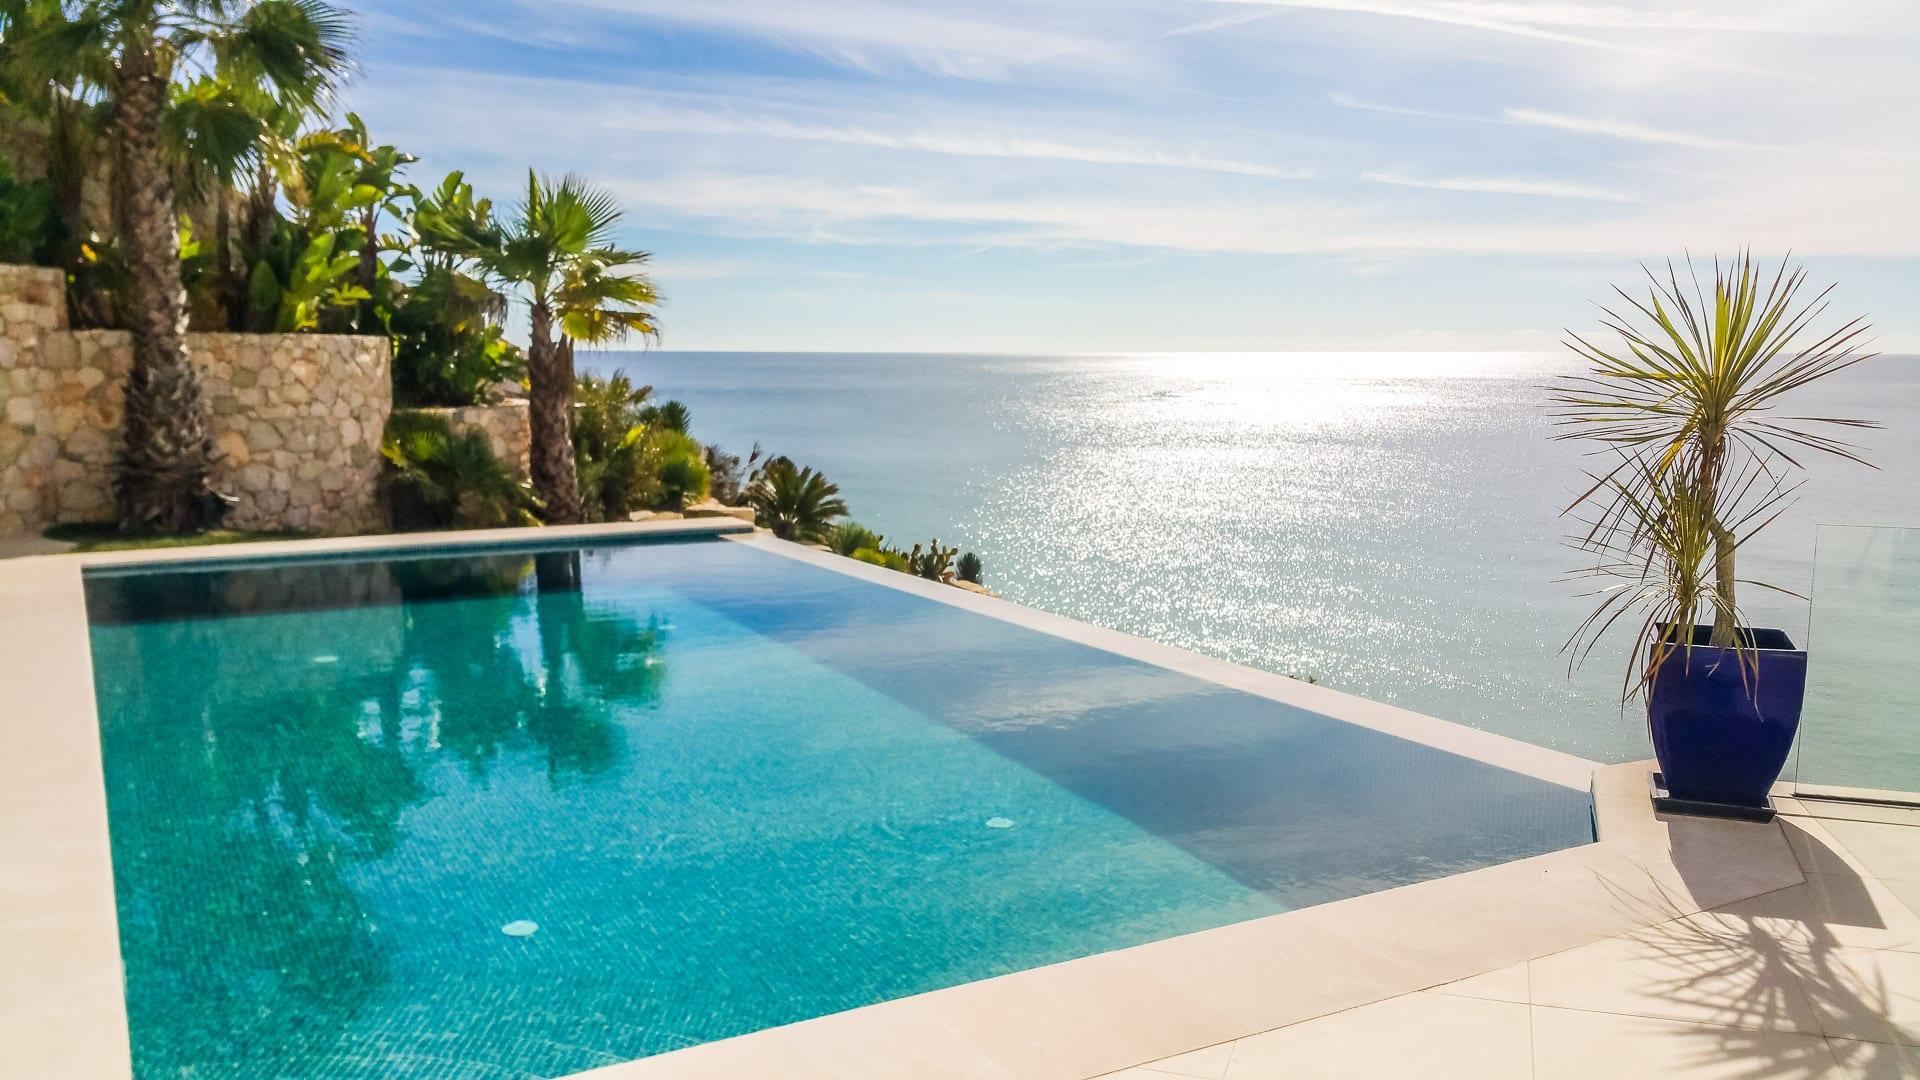 Algarve_VilaAlegria_12